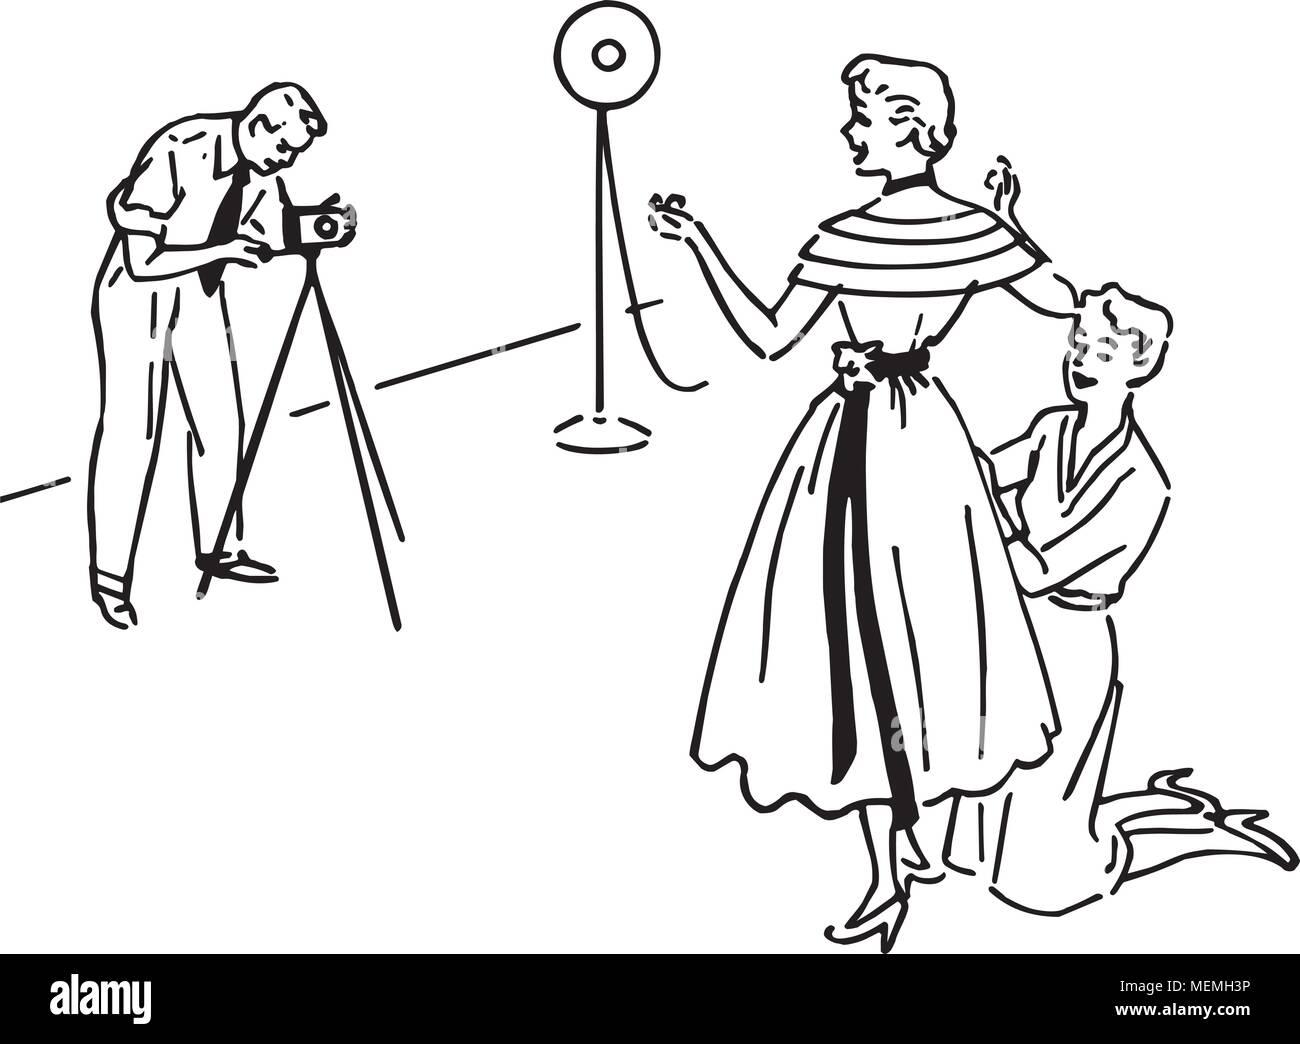 Fashion Photo Shoot - Retro Clipart Illustration - Stock Image